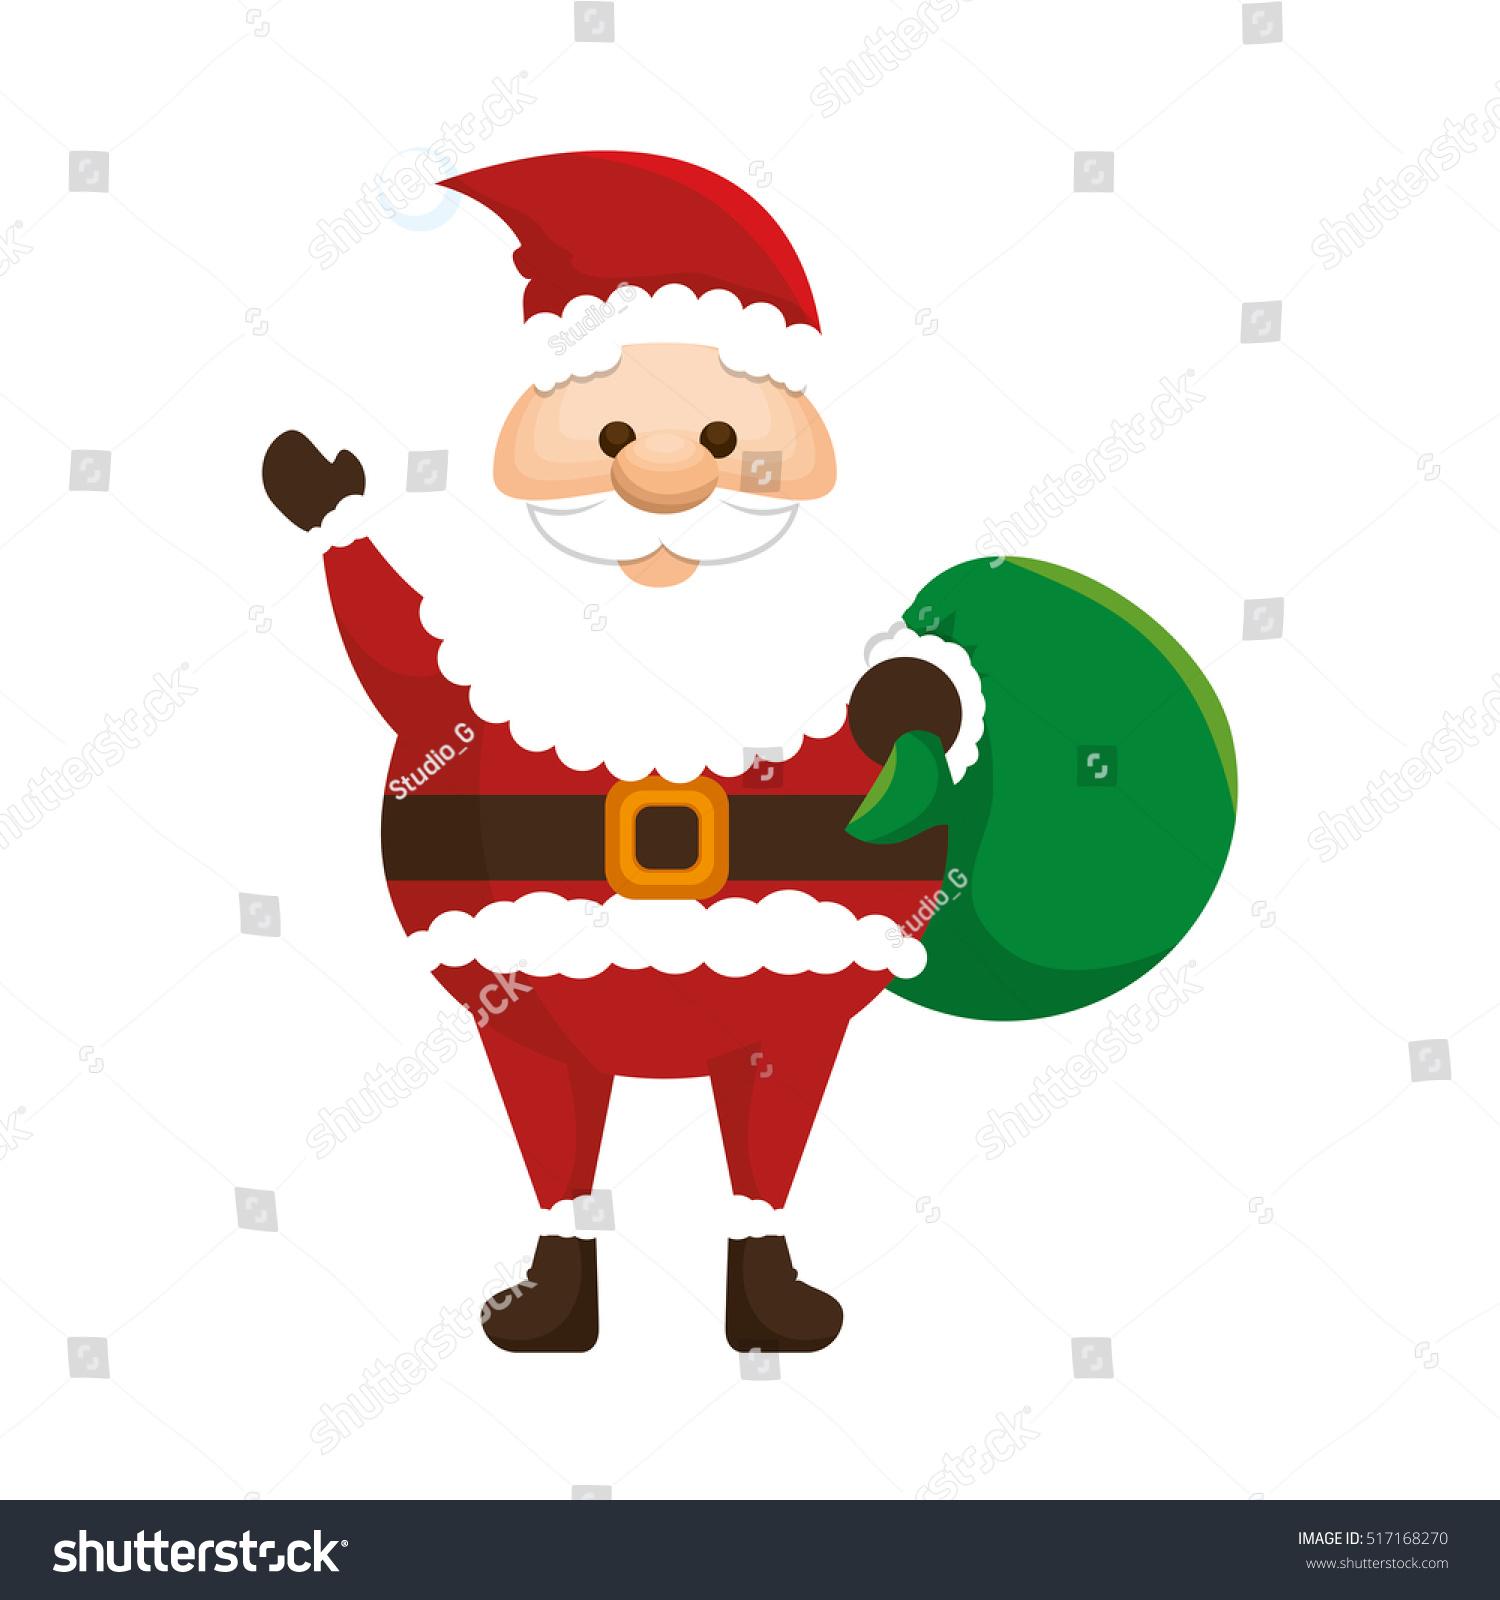 Uncategorized Imagenes Santa Claus santa claus character kawaii style stock vector 517168270 style